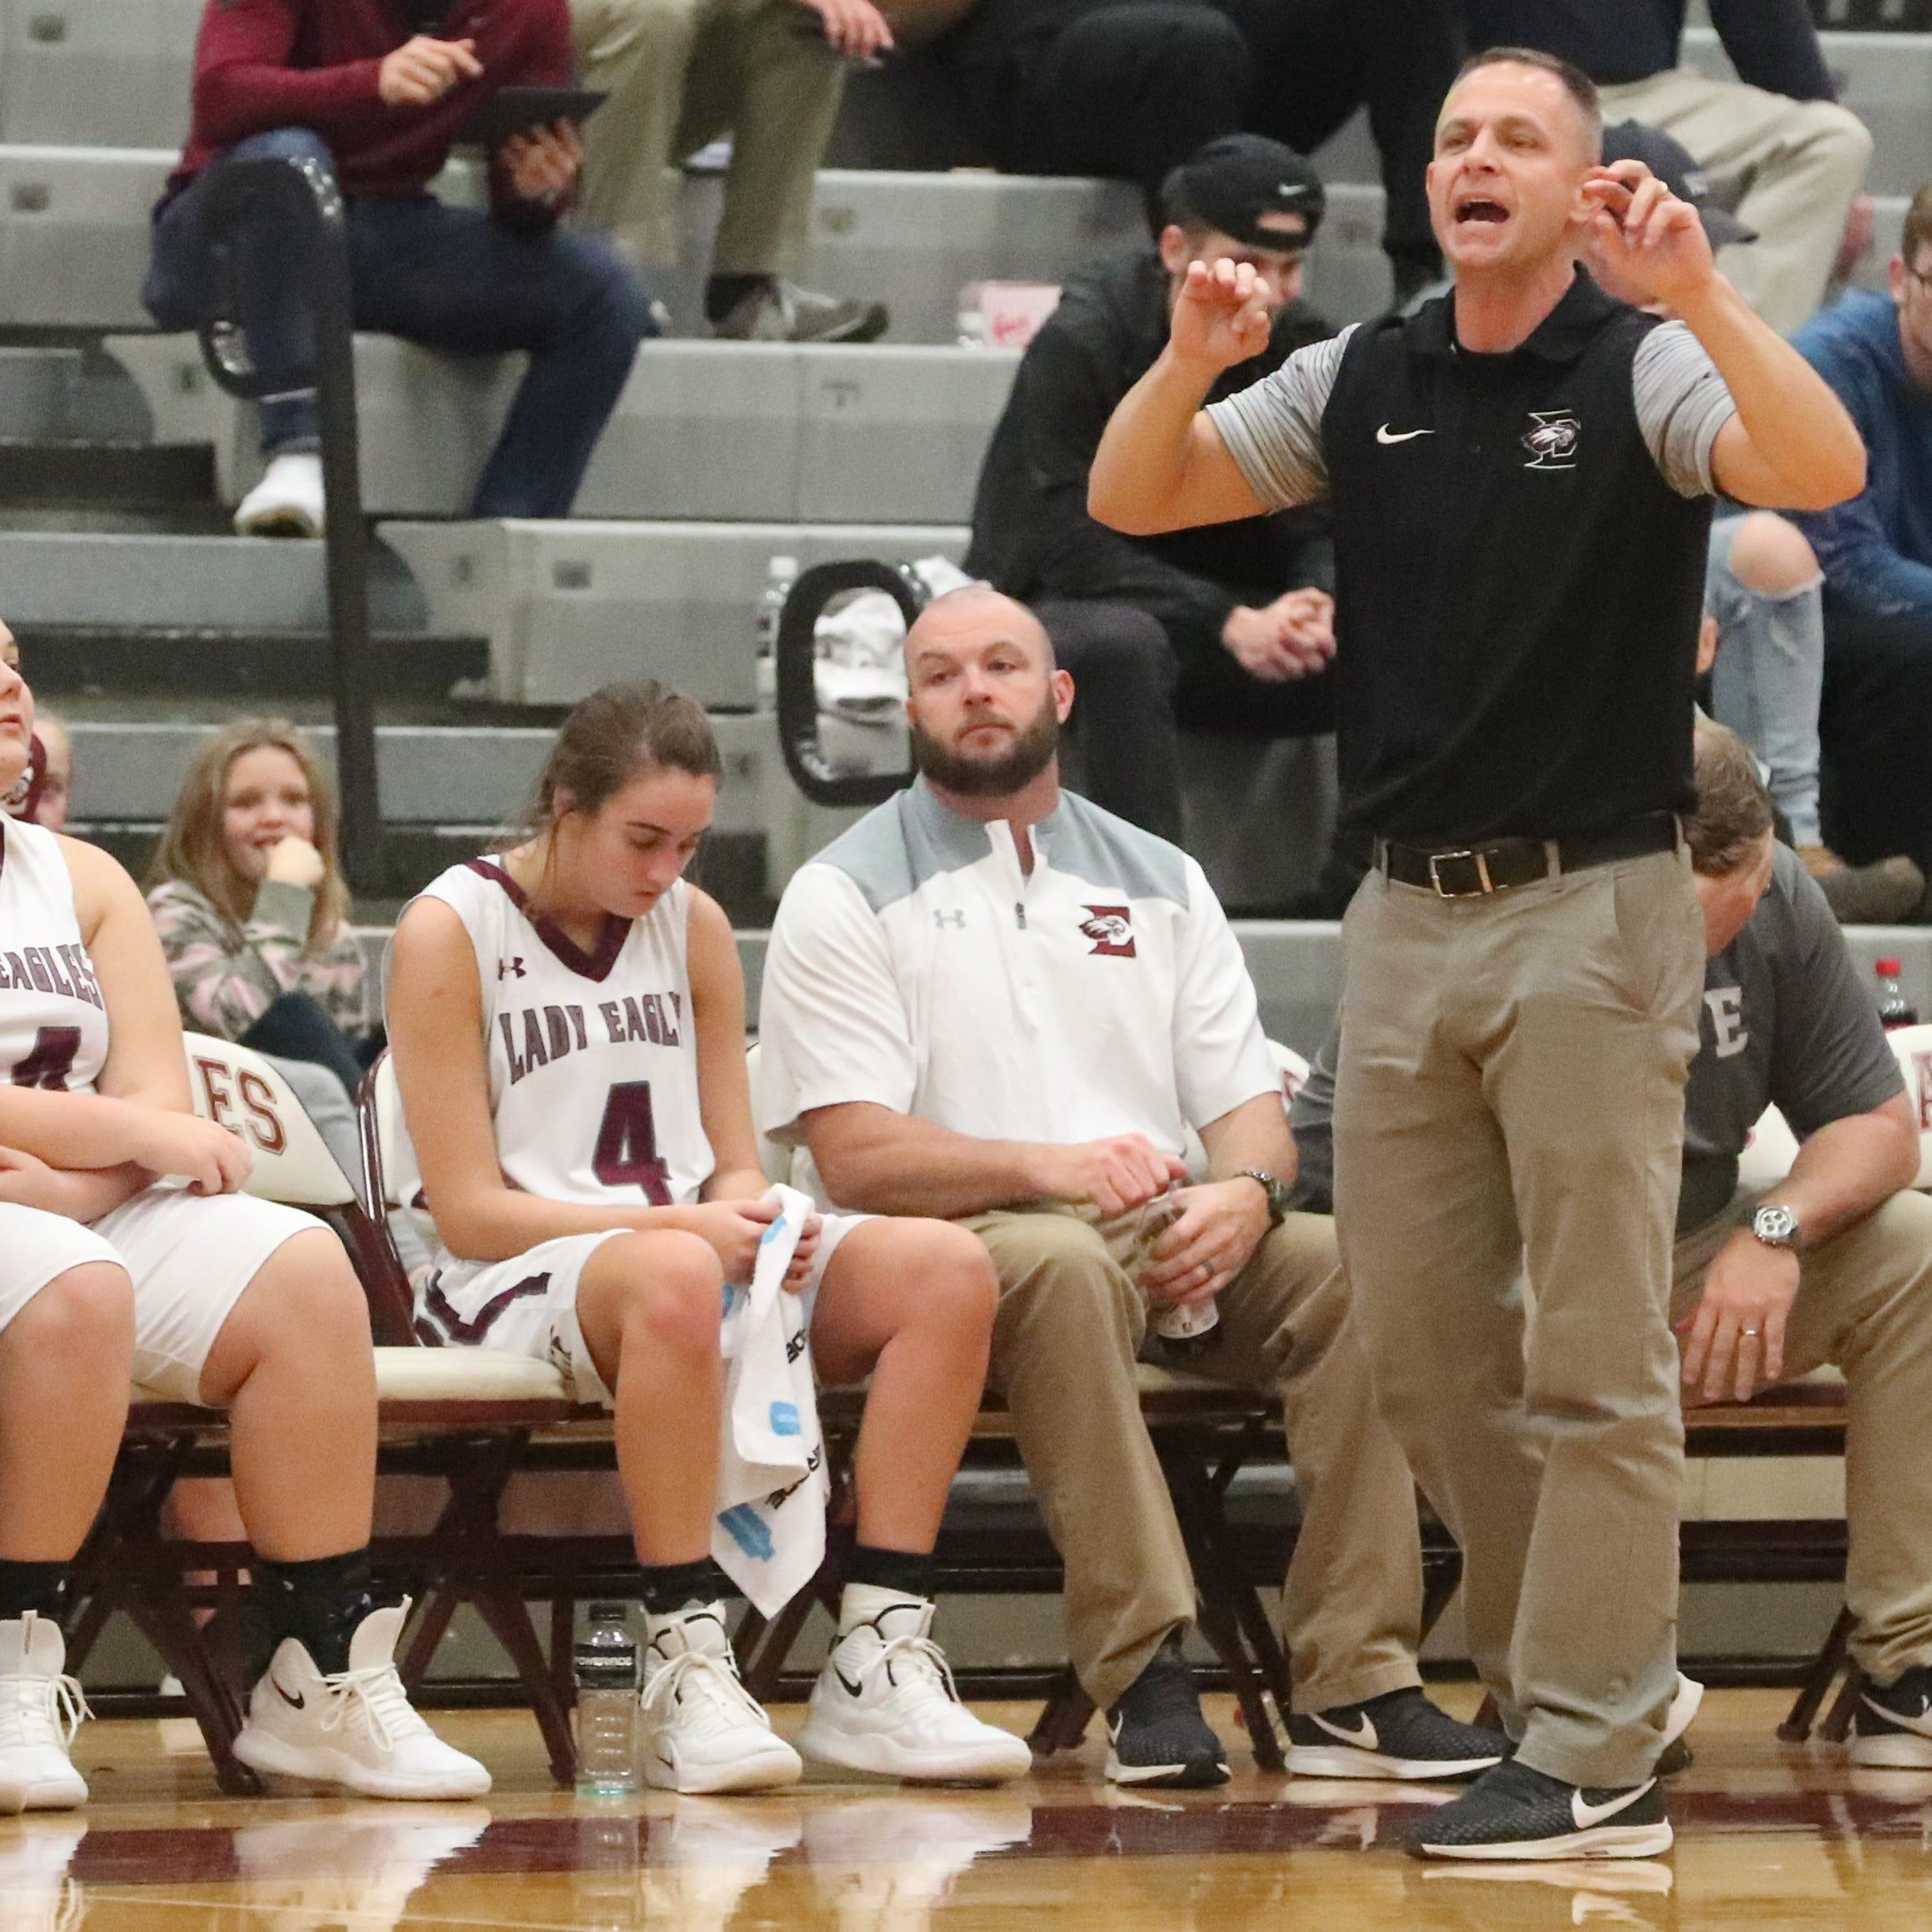 Changes help Eagleville girls basketball team hit late-season stride